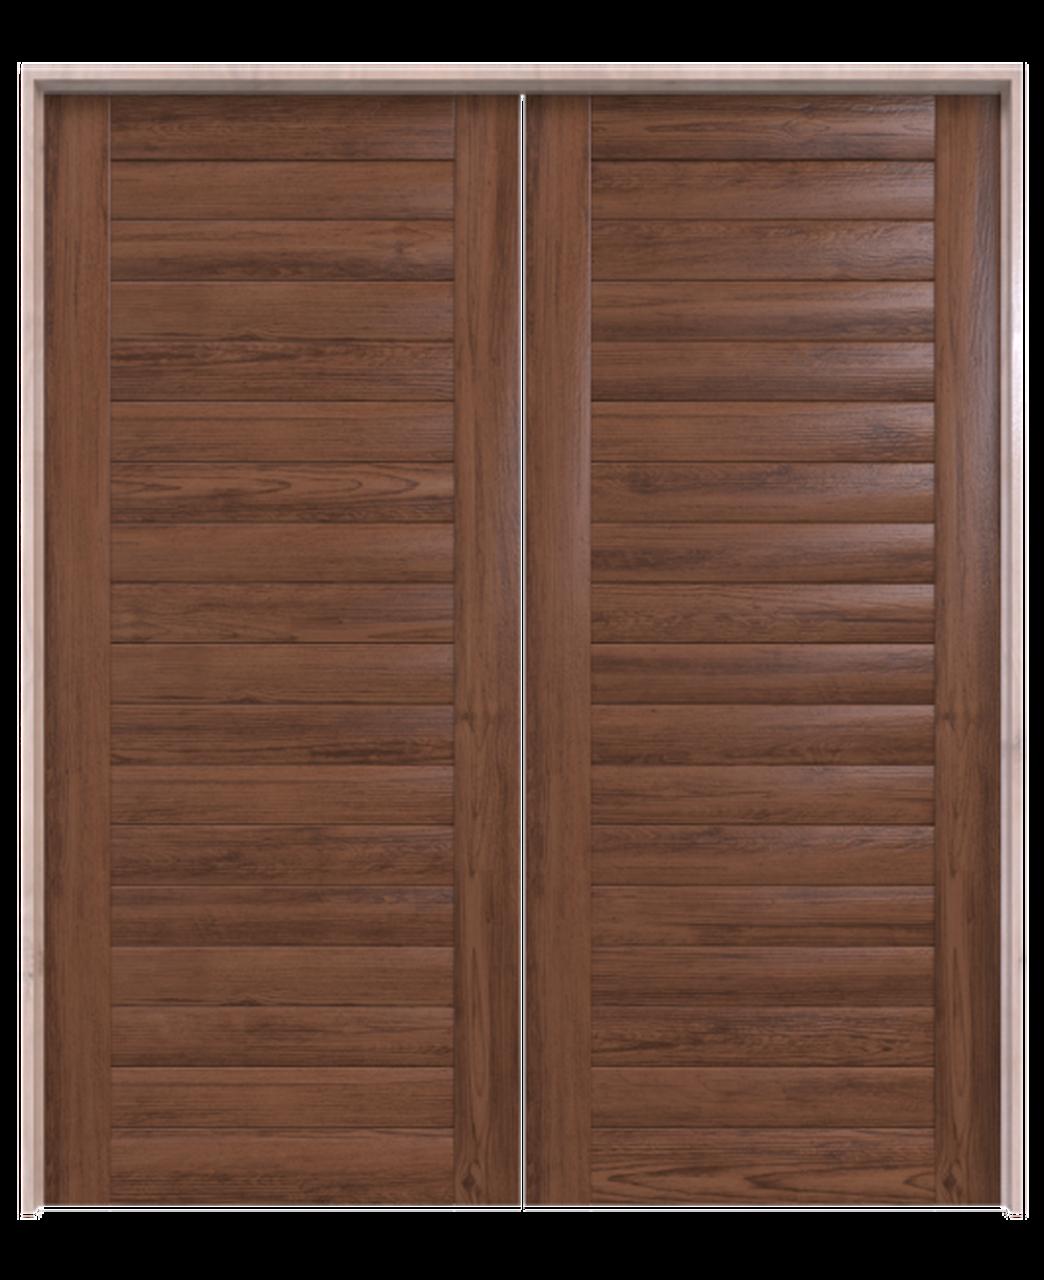 wood walnut horizontal full panel double barn door